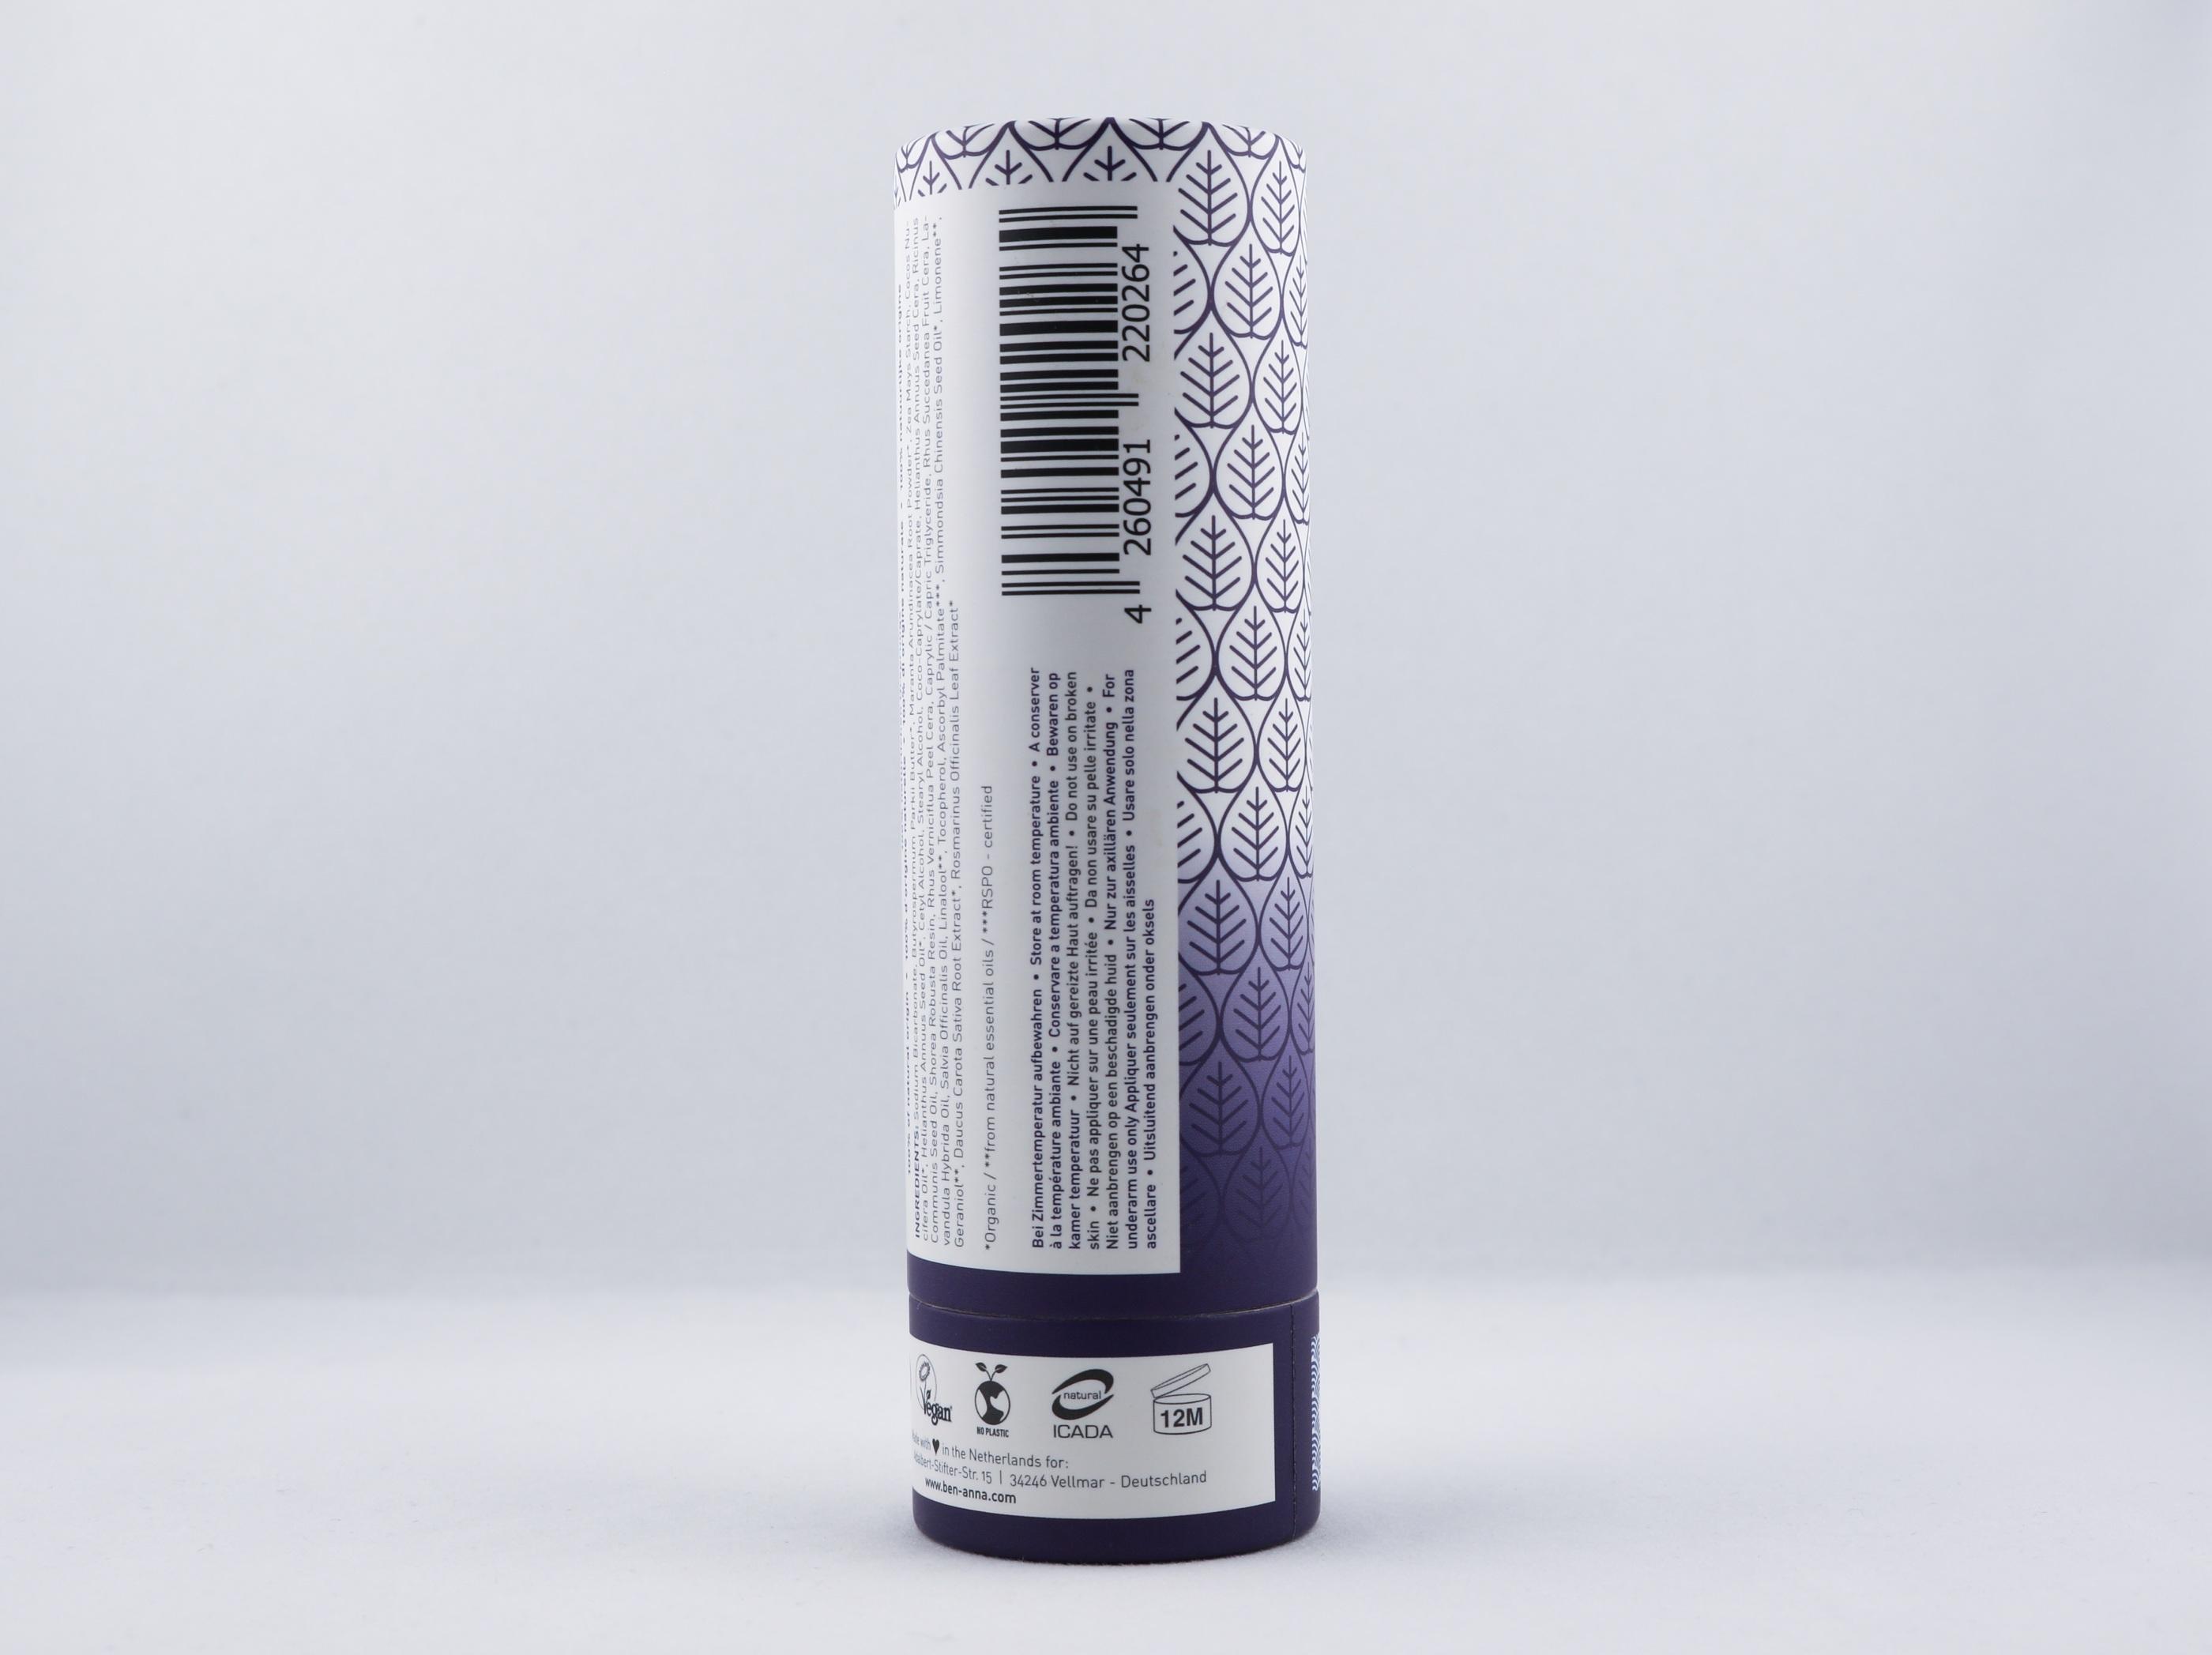 Deodorant - Provence wellness ayurveda halmstad sweden svensk hygien